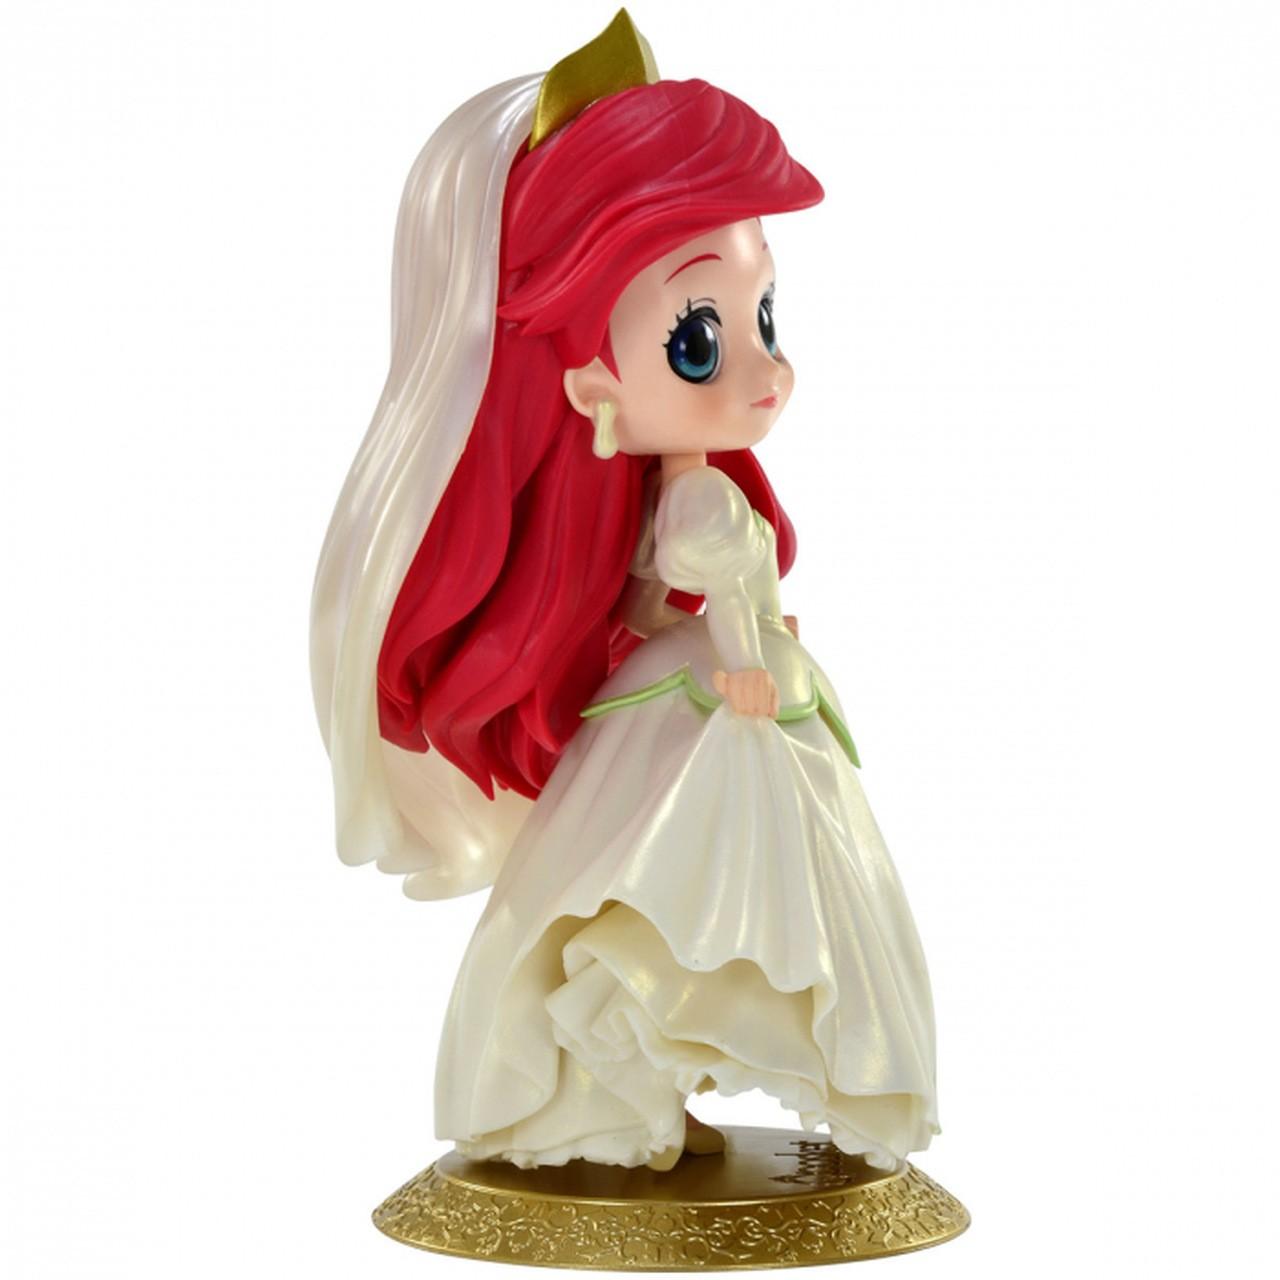 Estátua Princesa Ariel (Dreamy Style Special Collection): A Pequena Sereia Disney Qposket - Banpresto